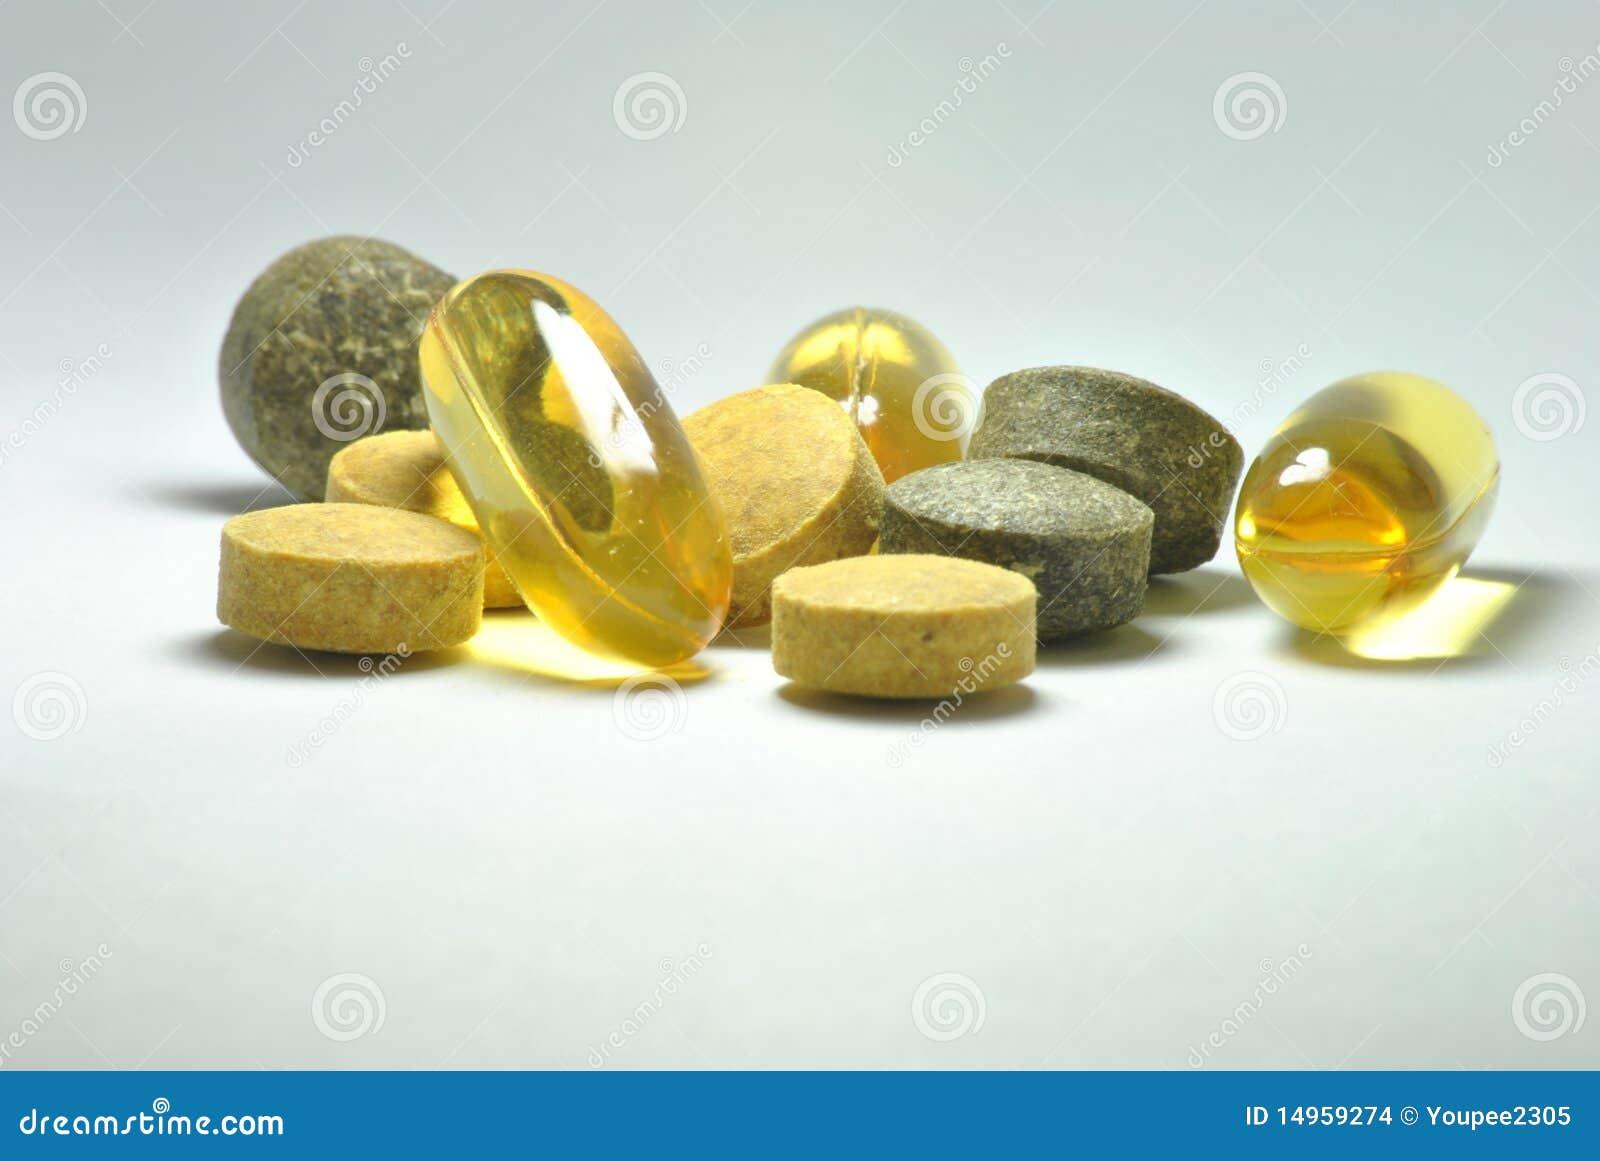 Píldoras de la salud